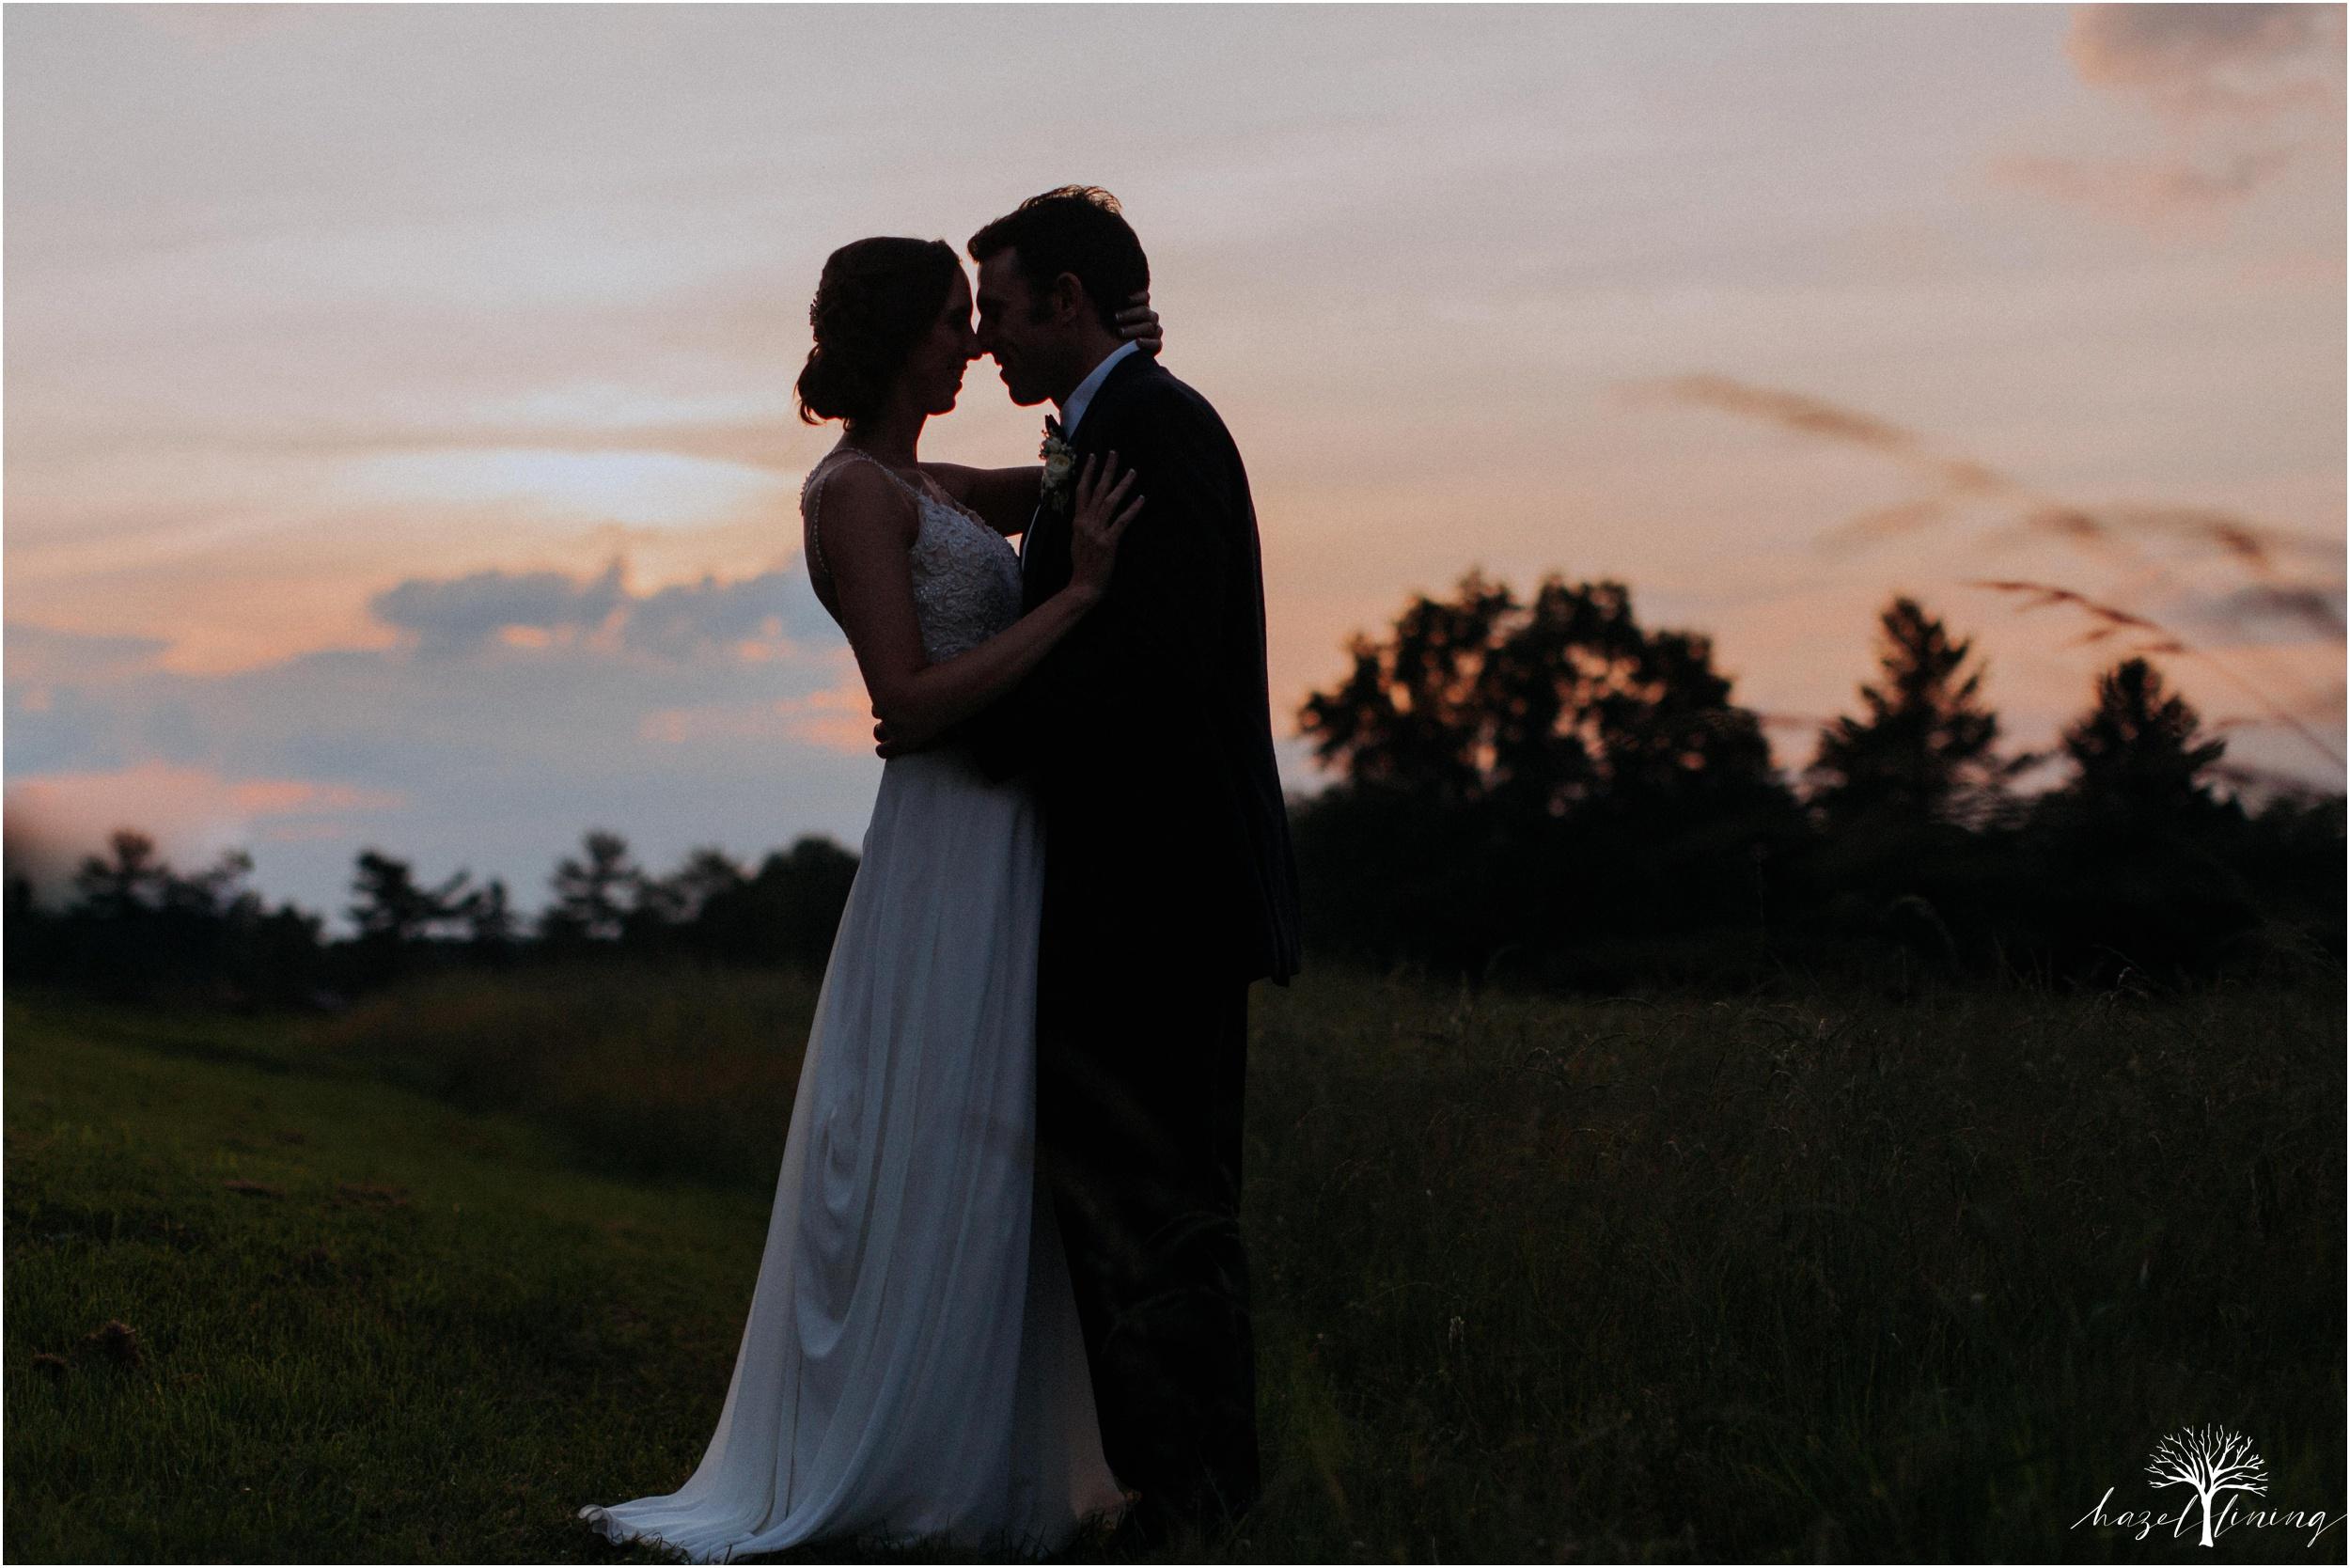 hazel-lining-travel-wedding-elopement-photography_0176.jpg